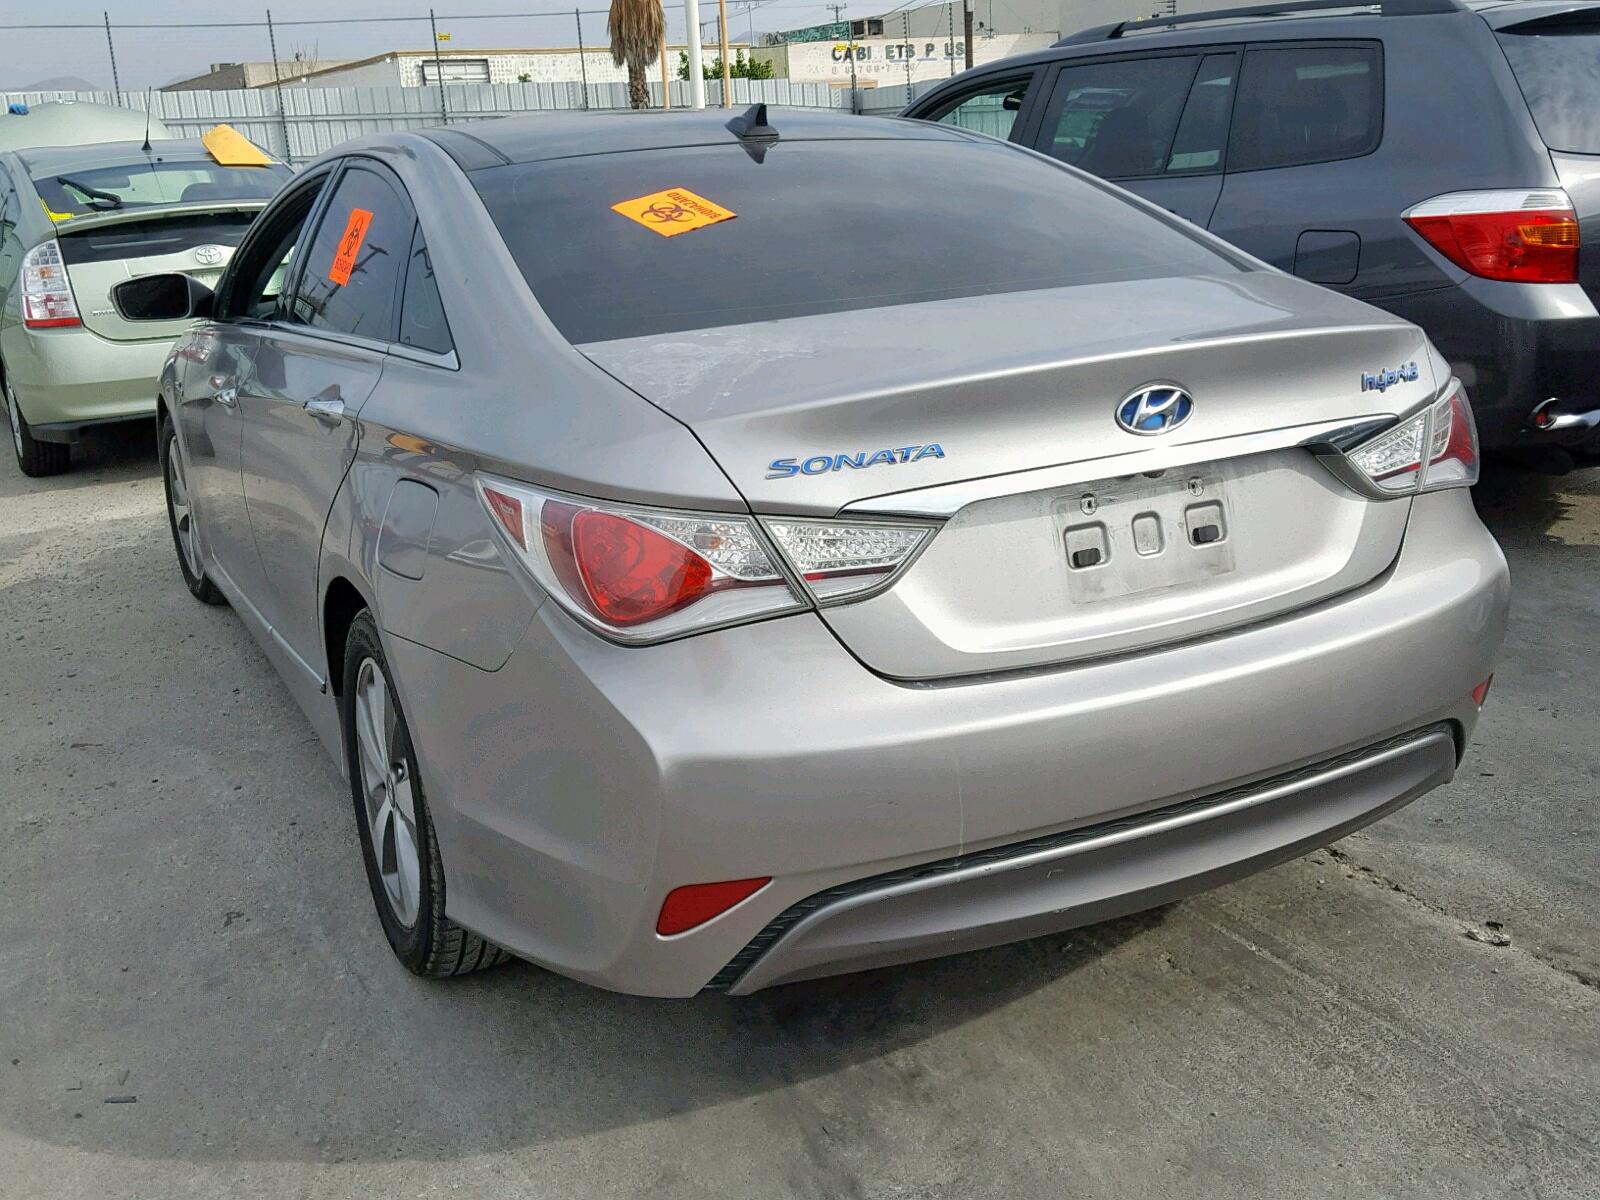 2012 Hyundai Sonata Hyb 2.4L [Angle] View